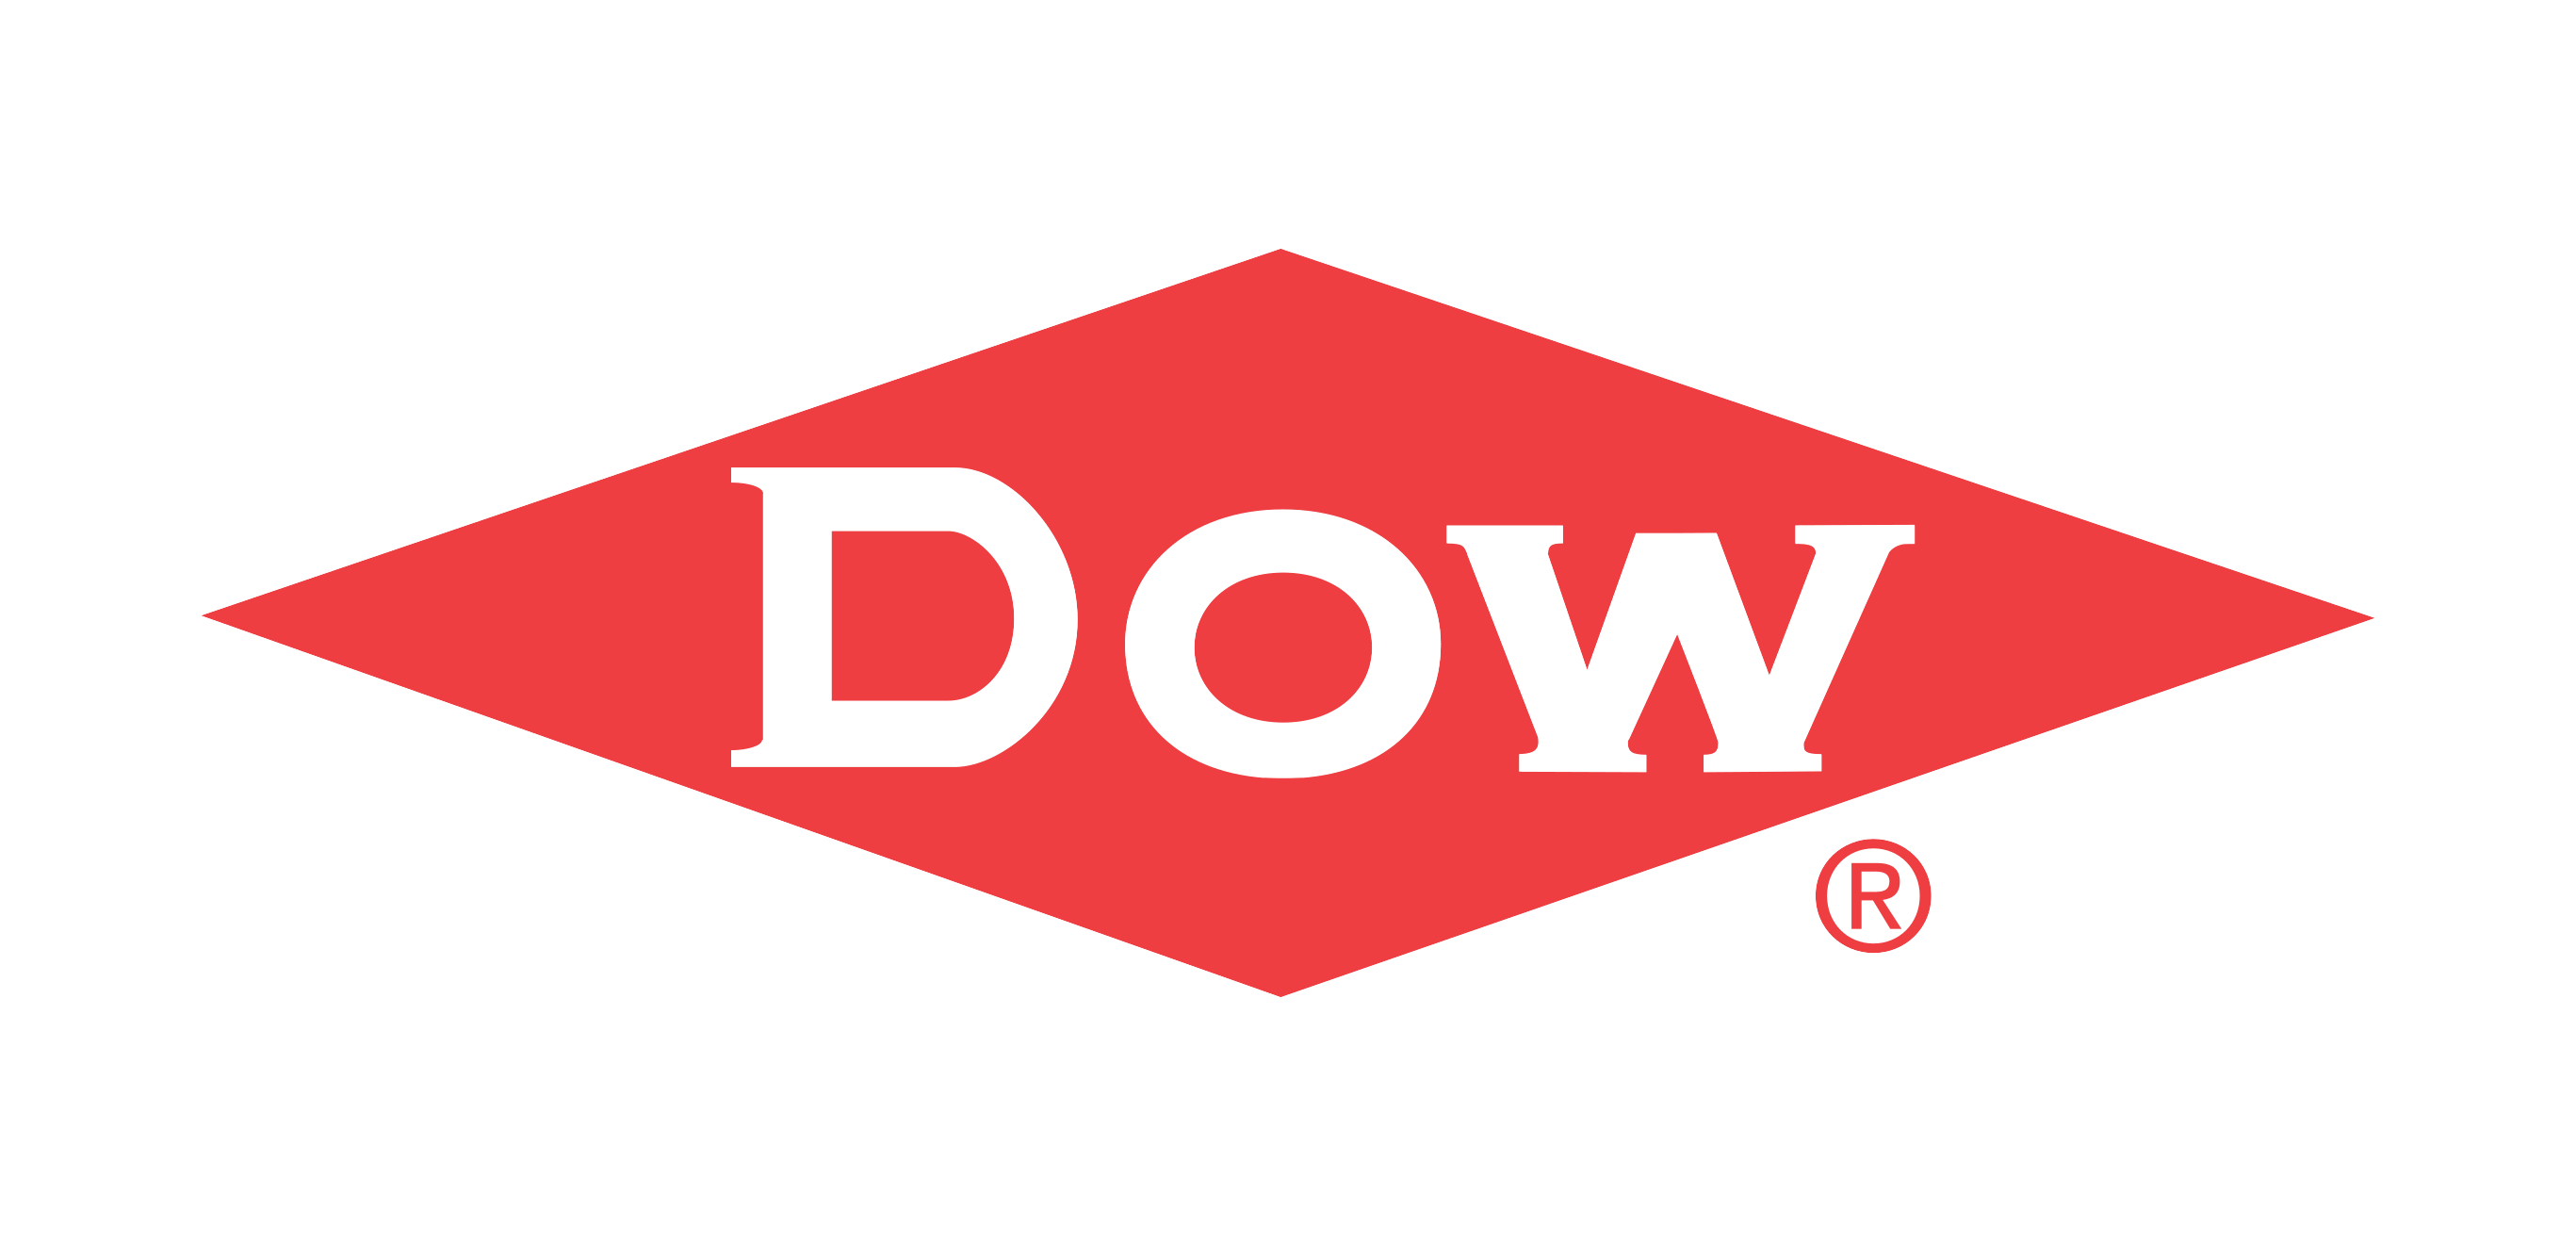 Dow_Chemical_Company_logo doorz